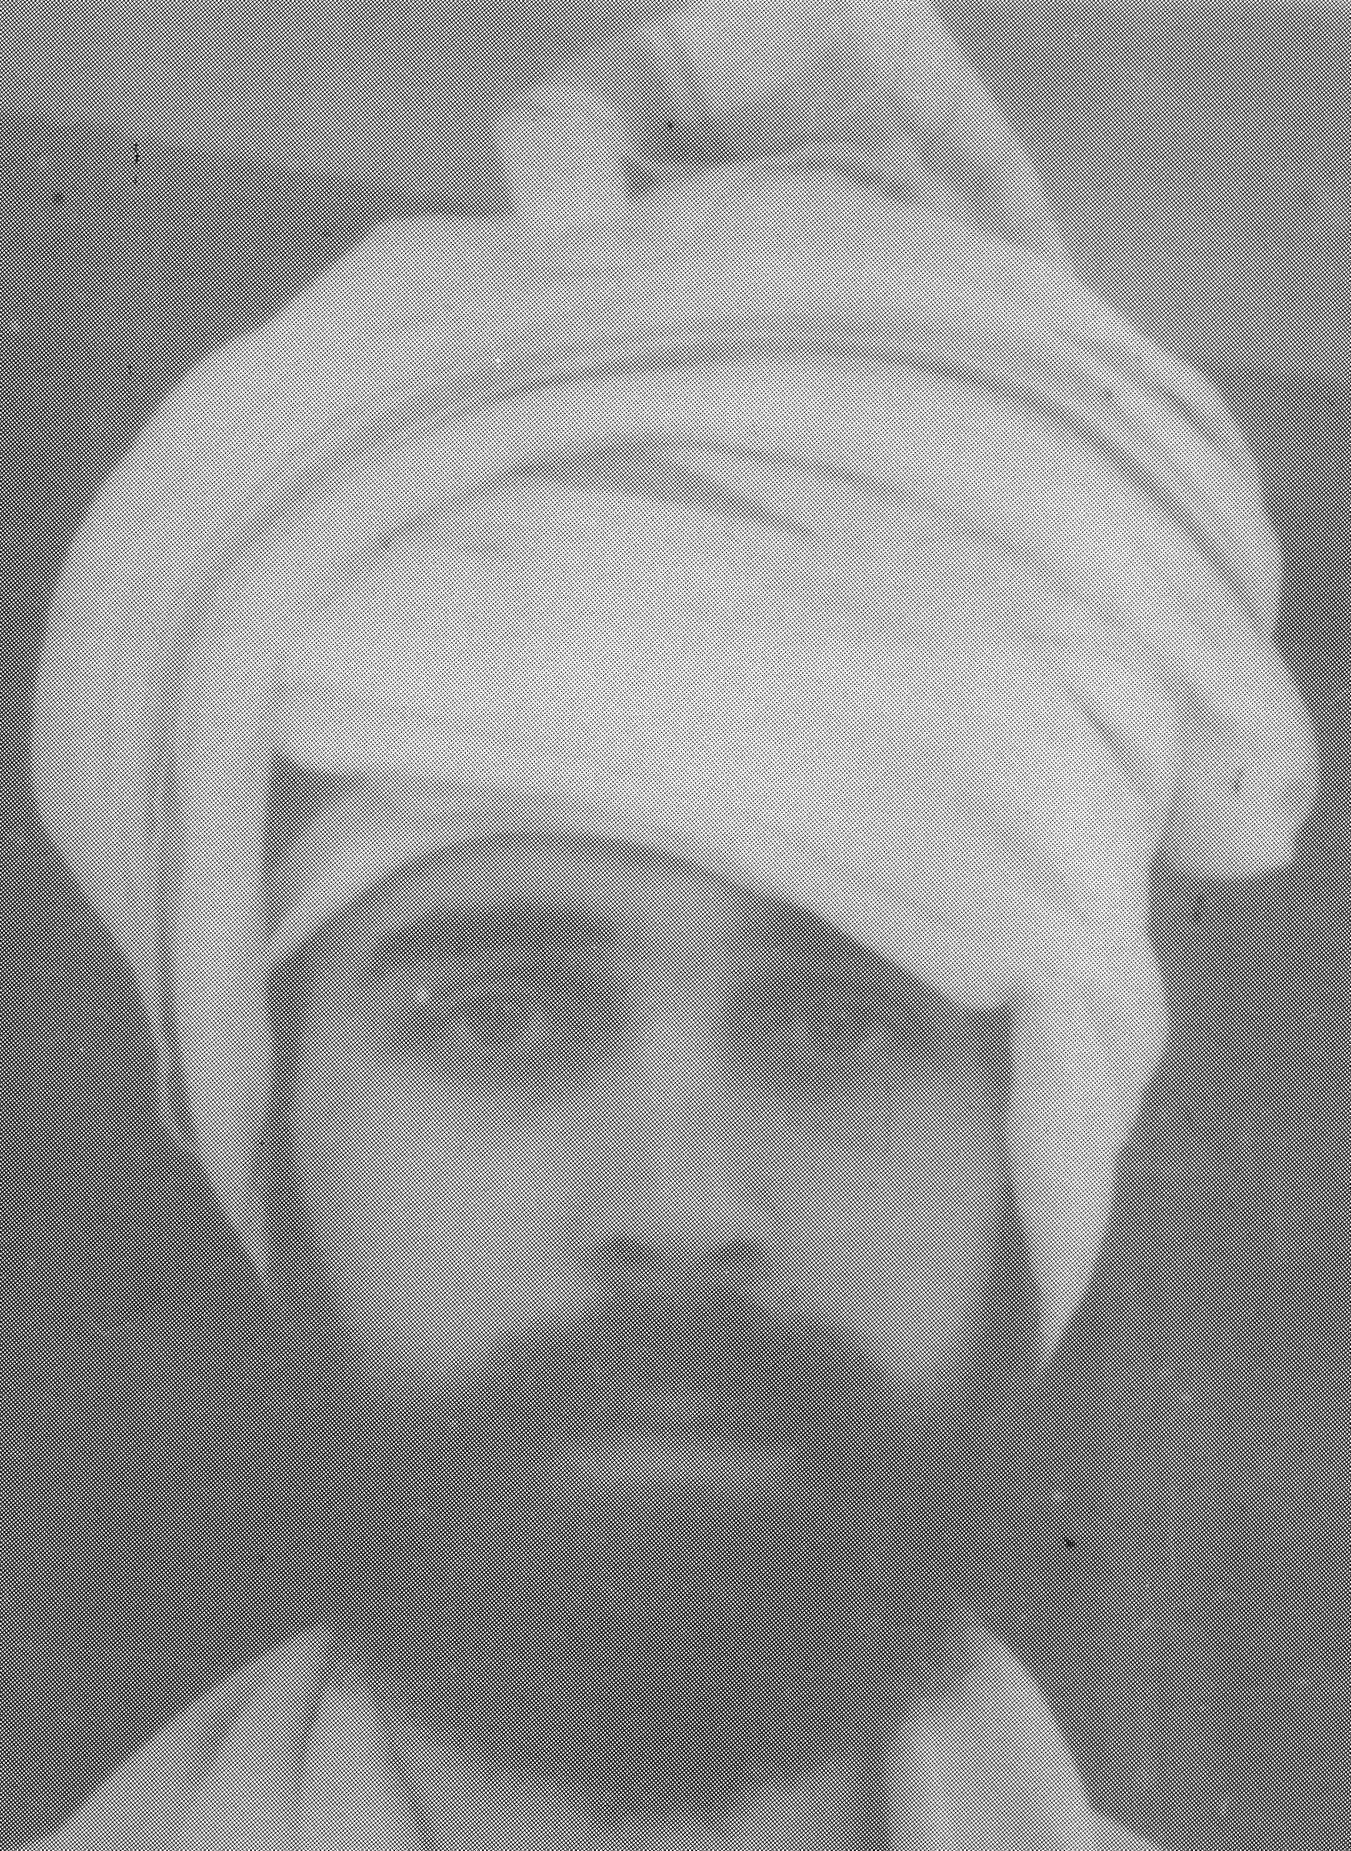 1969-0723-xx-073a-Robin-Kumbakonam-India-after-13-months-alone